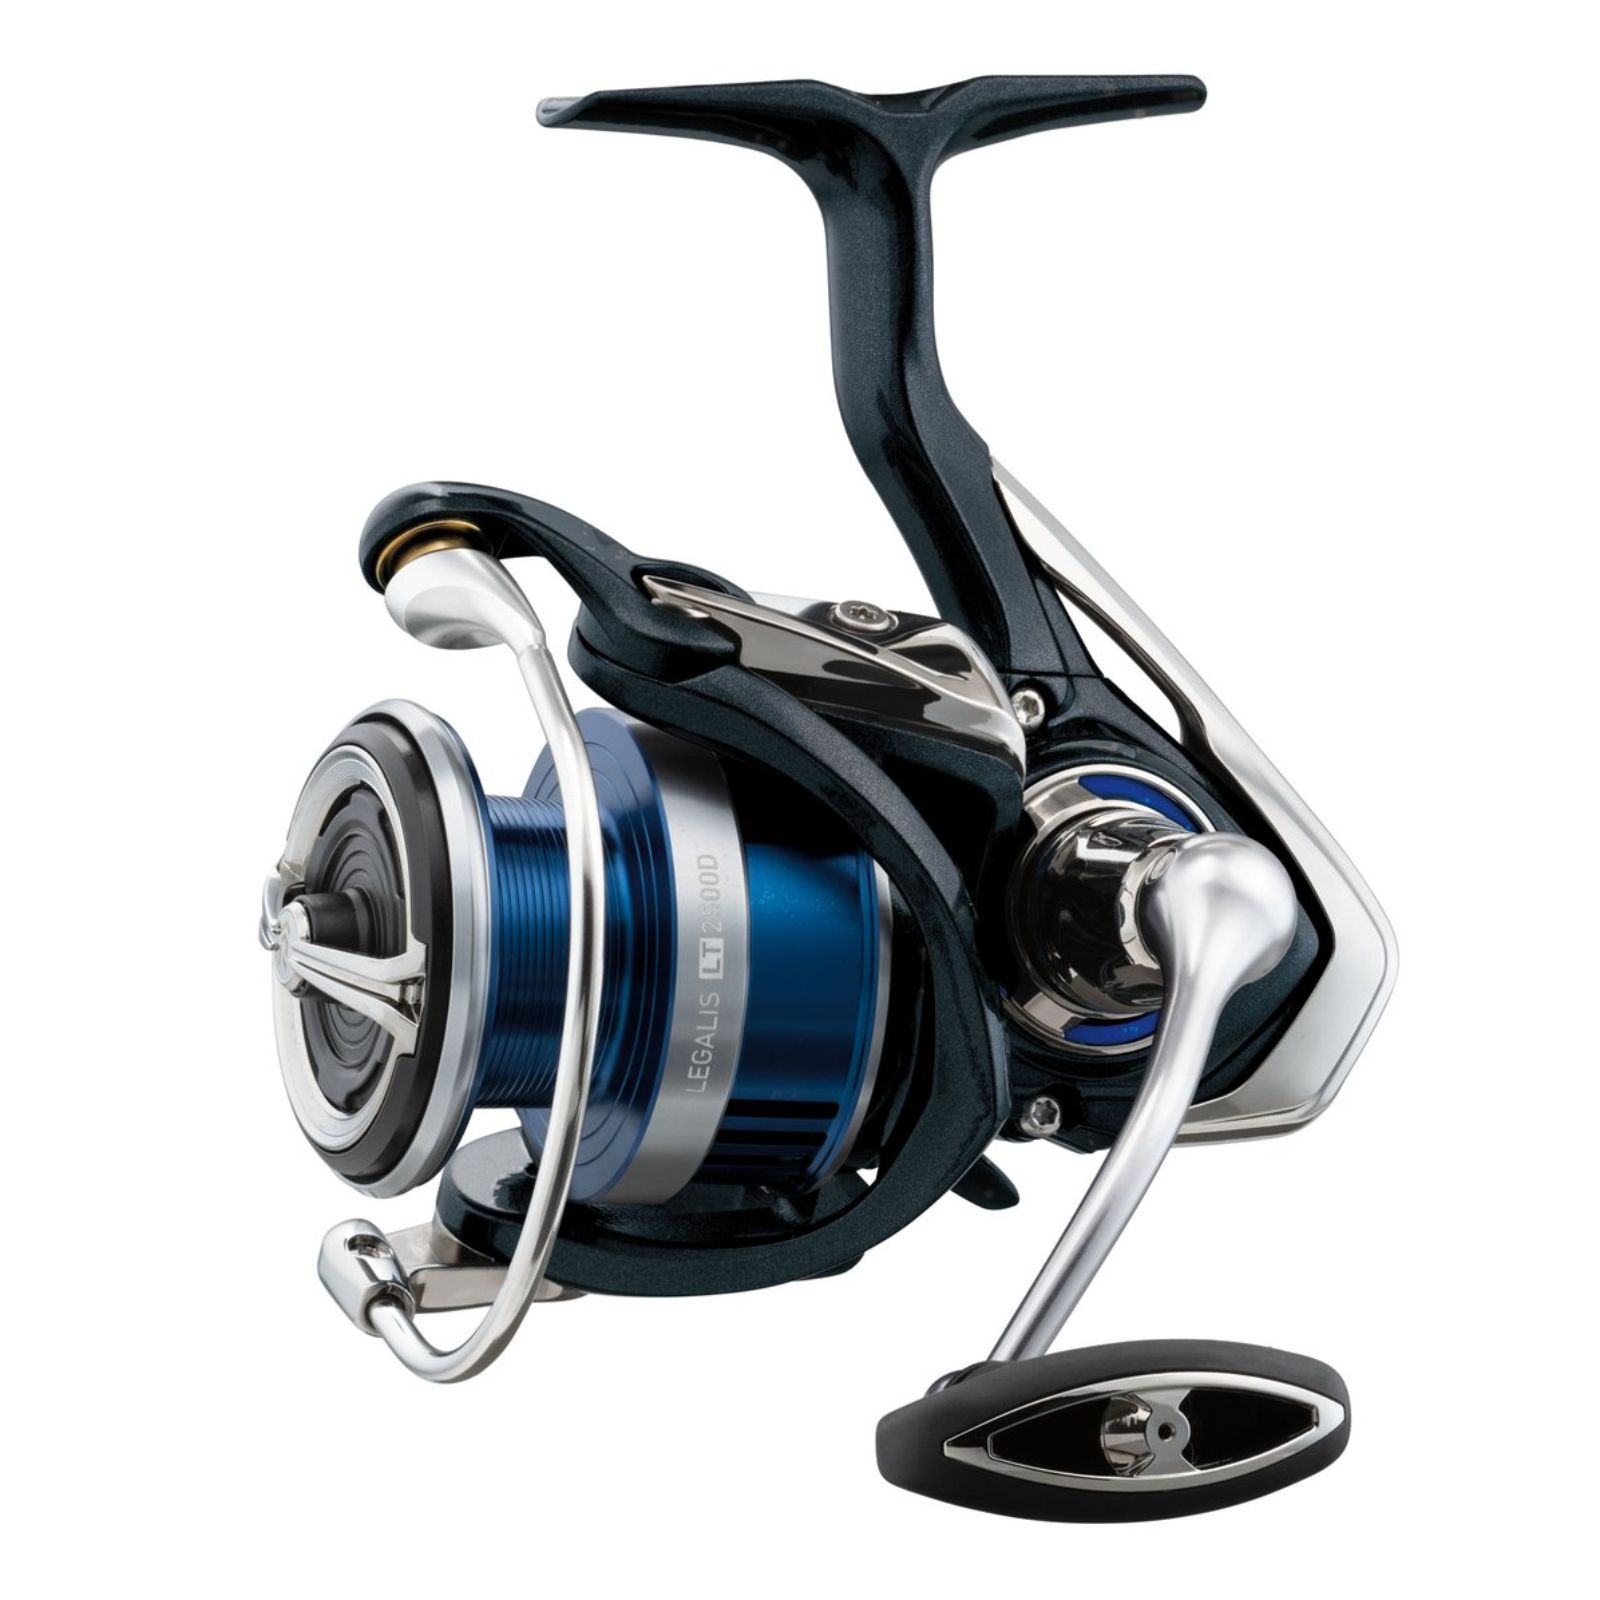 Daiwa Legalis LT 4000D-C Spinning Reel